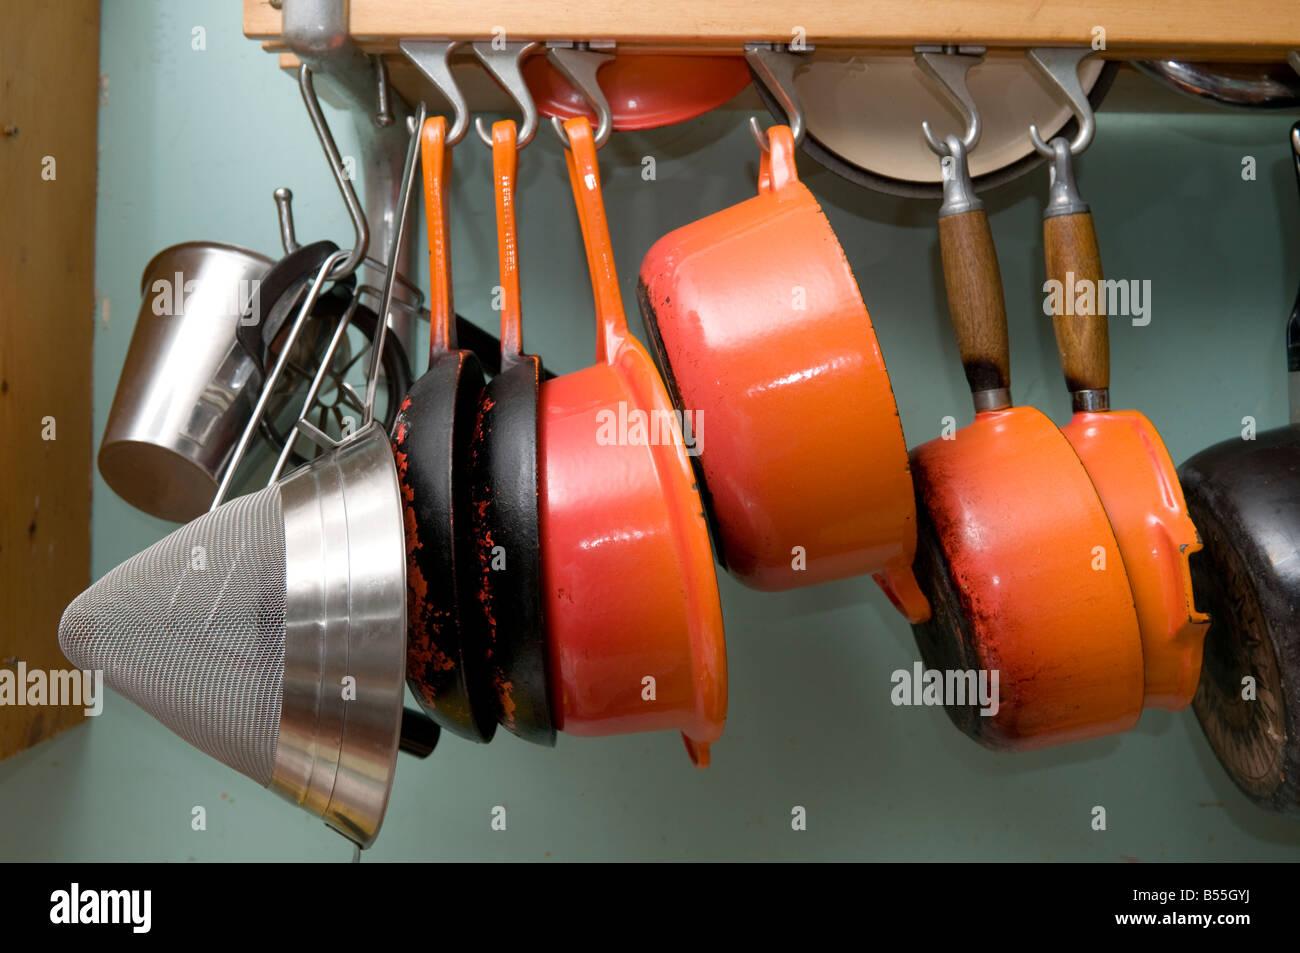 Le creuset cast iron saucepan set - Stock Photo Set Of Orange Cast Iron Le Creuset Pans Pots Saucepan Saucepans Utensils Hanging From Hooks In A Kitchen Uk